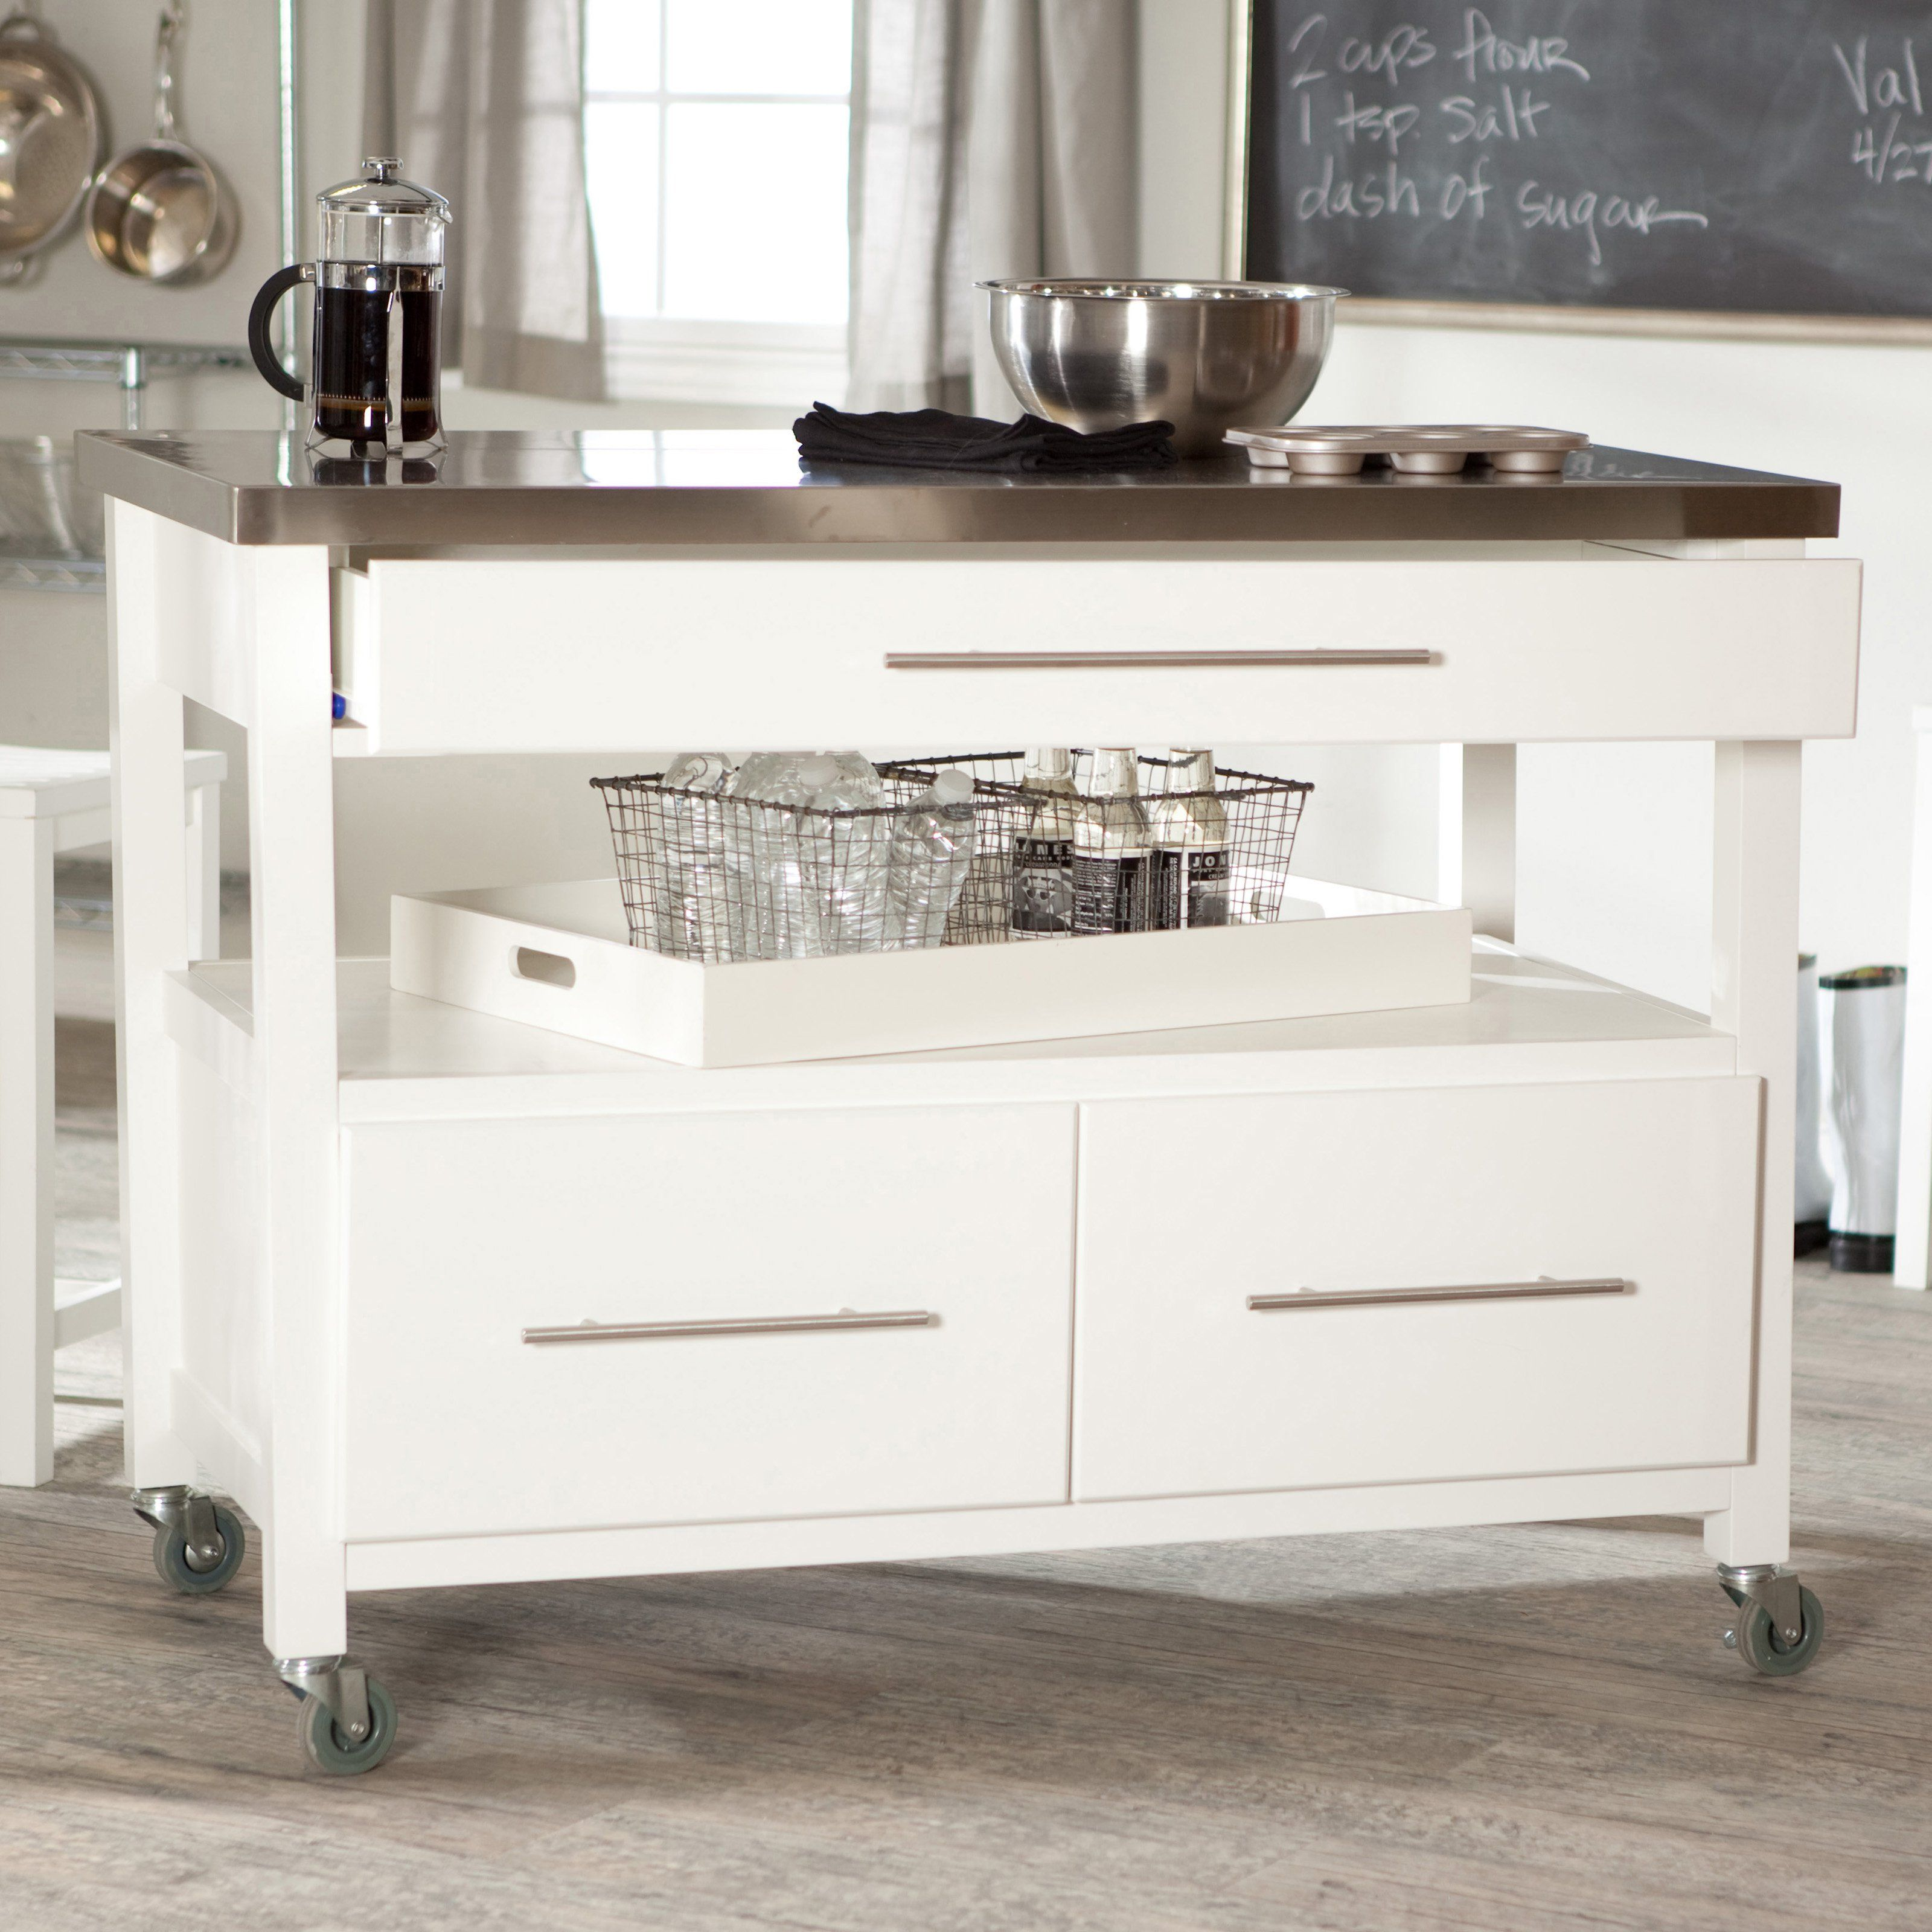 1000 images about joe berardi furniture restoration portable kitchen islands  on pinterest portable kitchen island kitchen